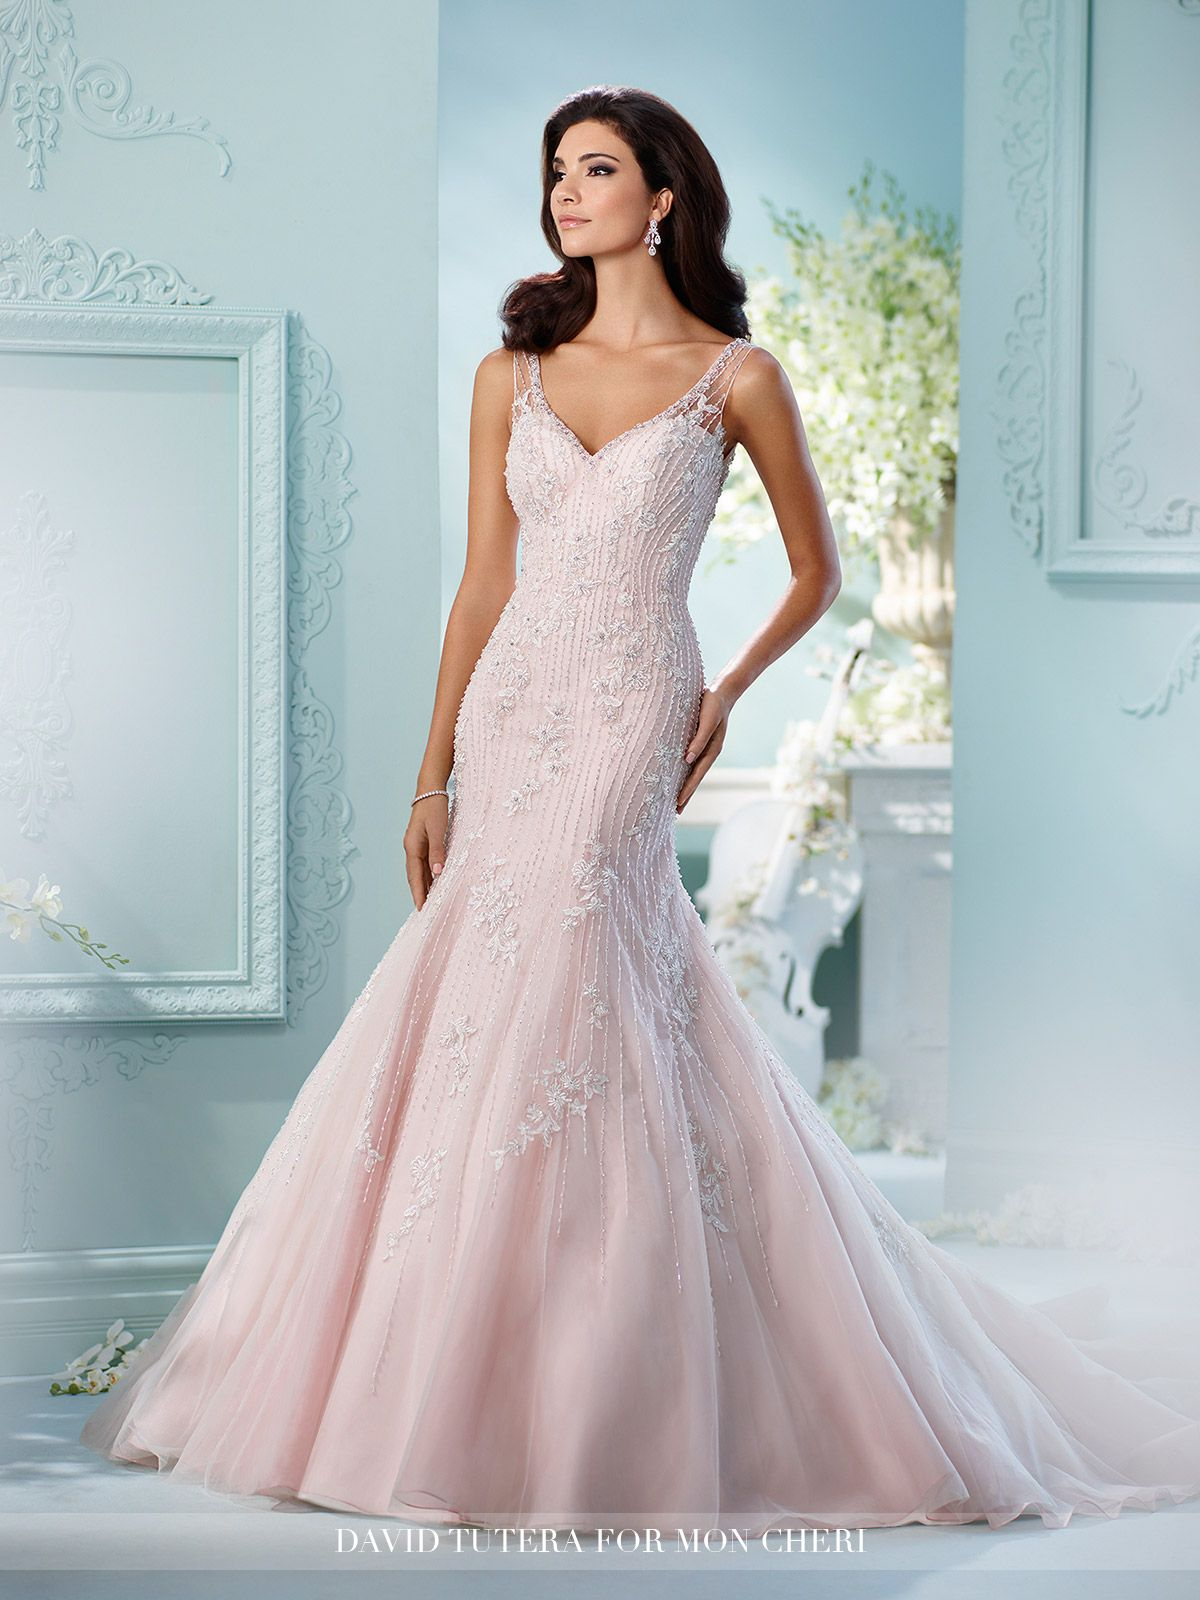 Unique Wedding Dresses Fall 2018 - Martin Thornburg   León